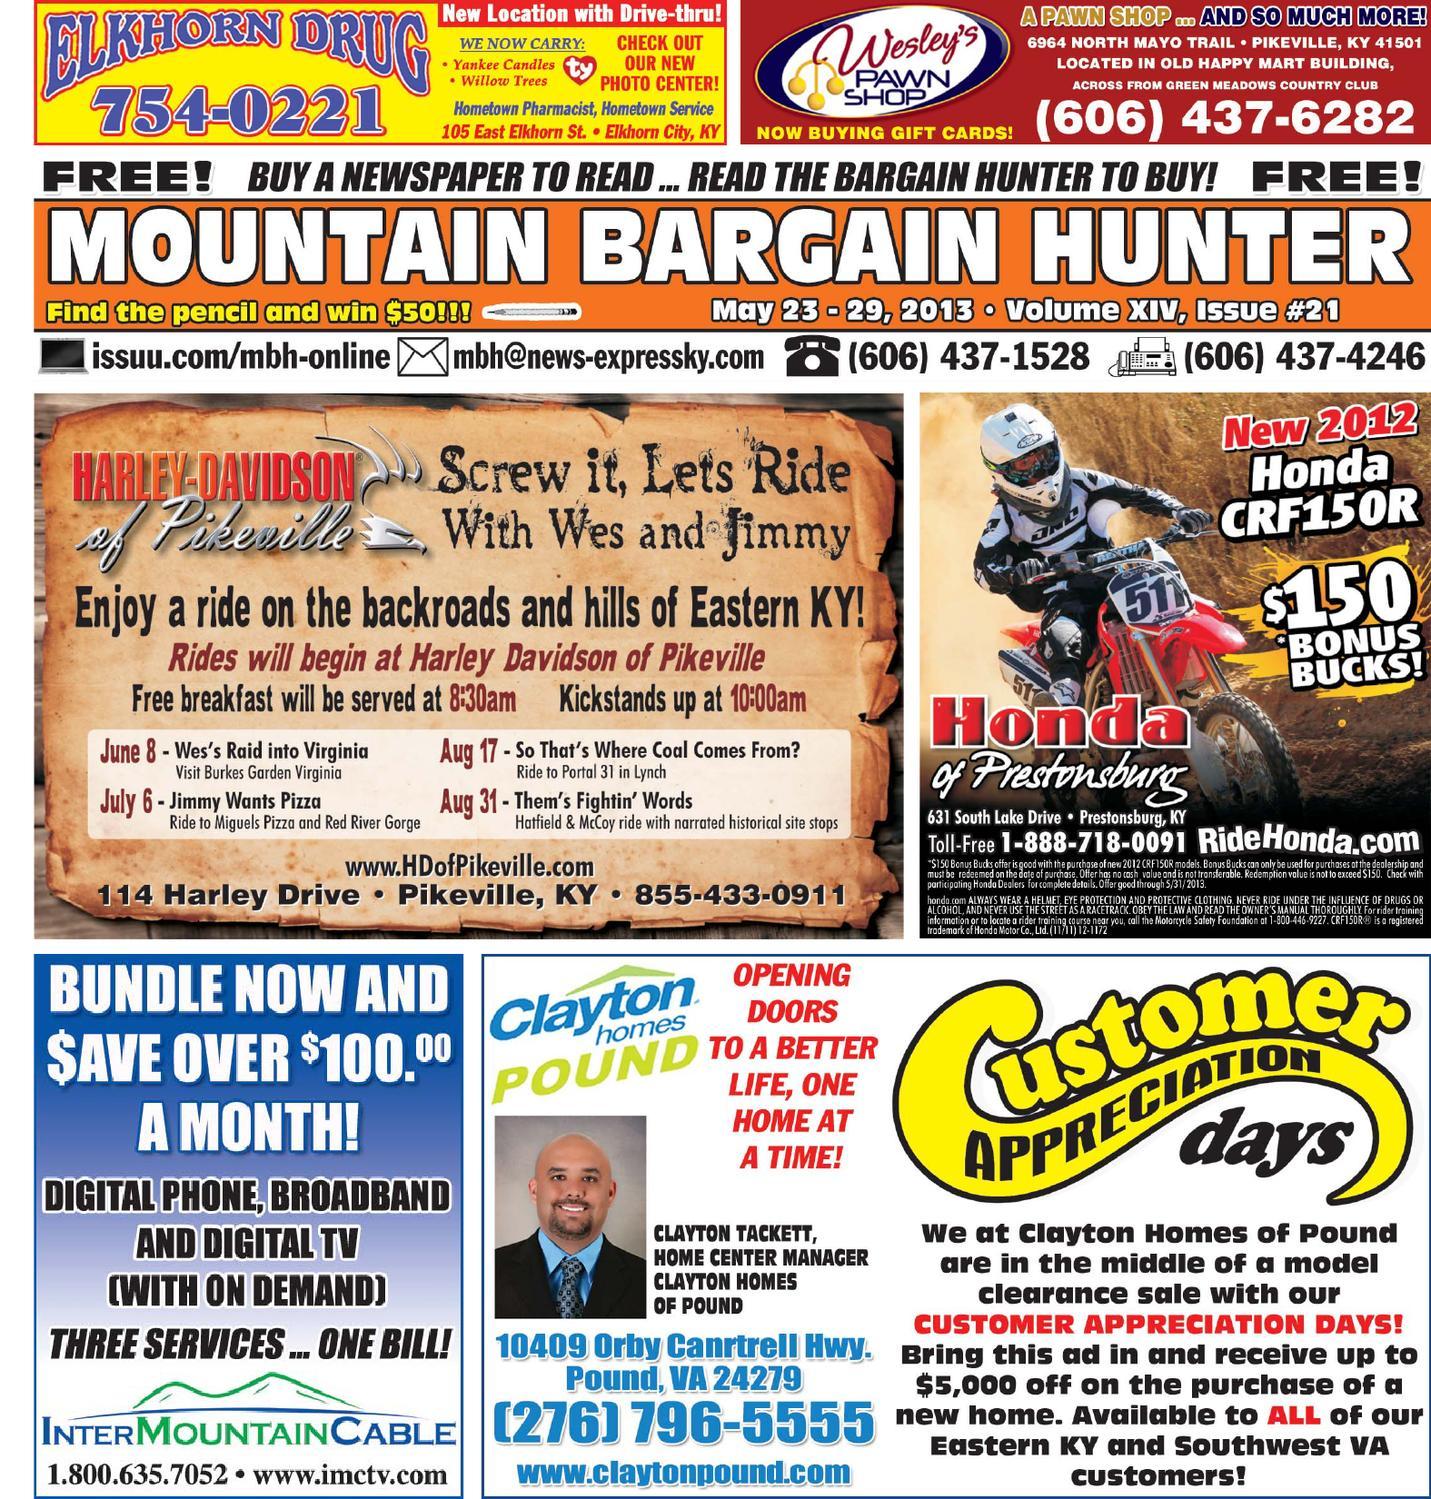 Mountain Bargain Hunter 5-23-13 by Jeff Keathley - issuu